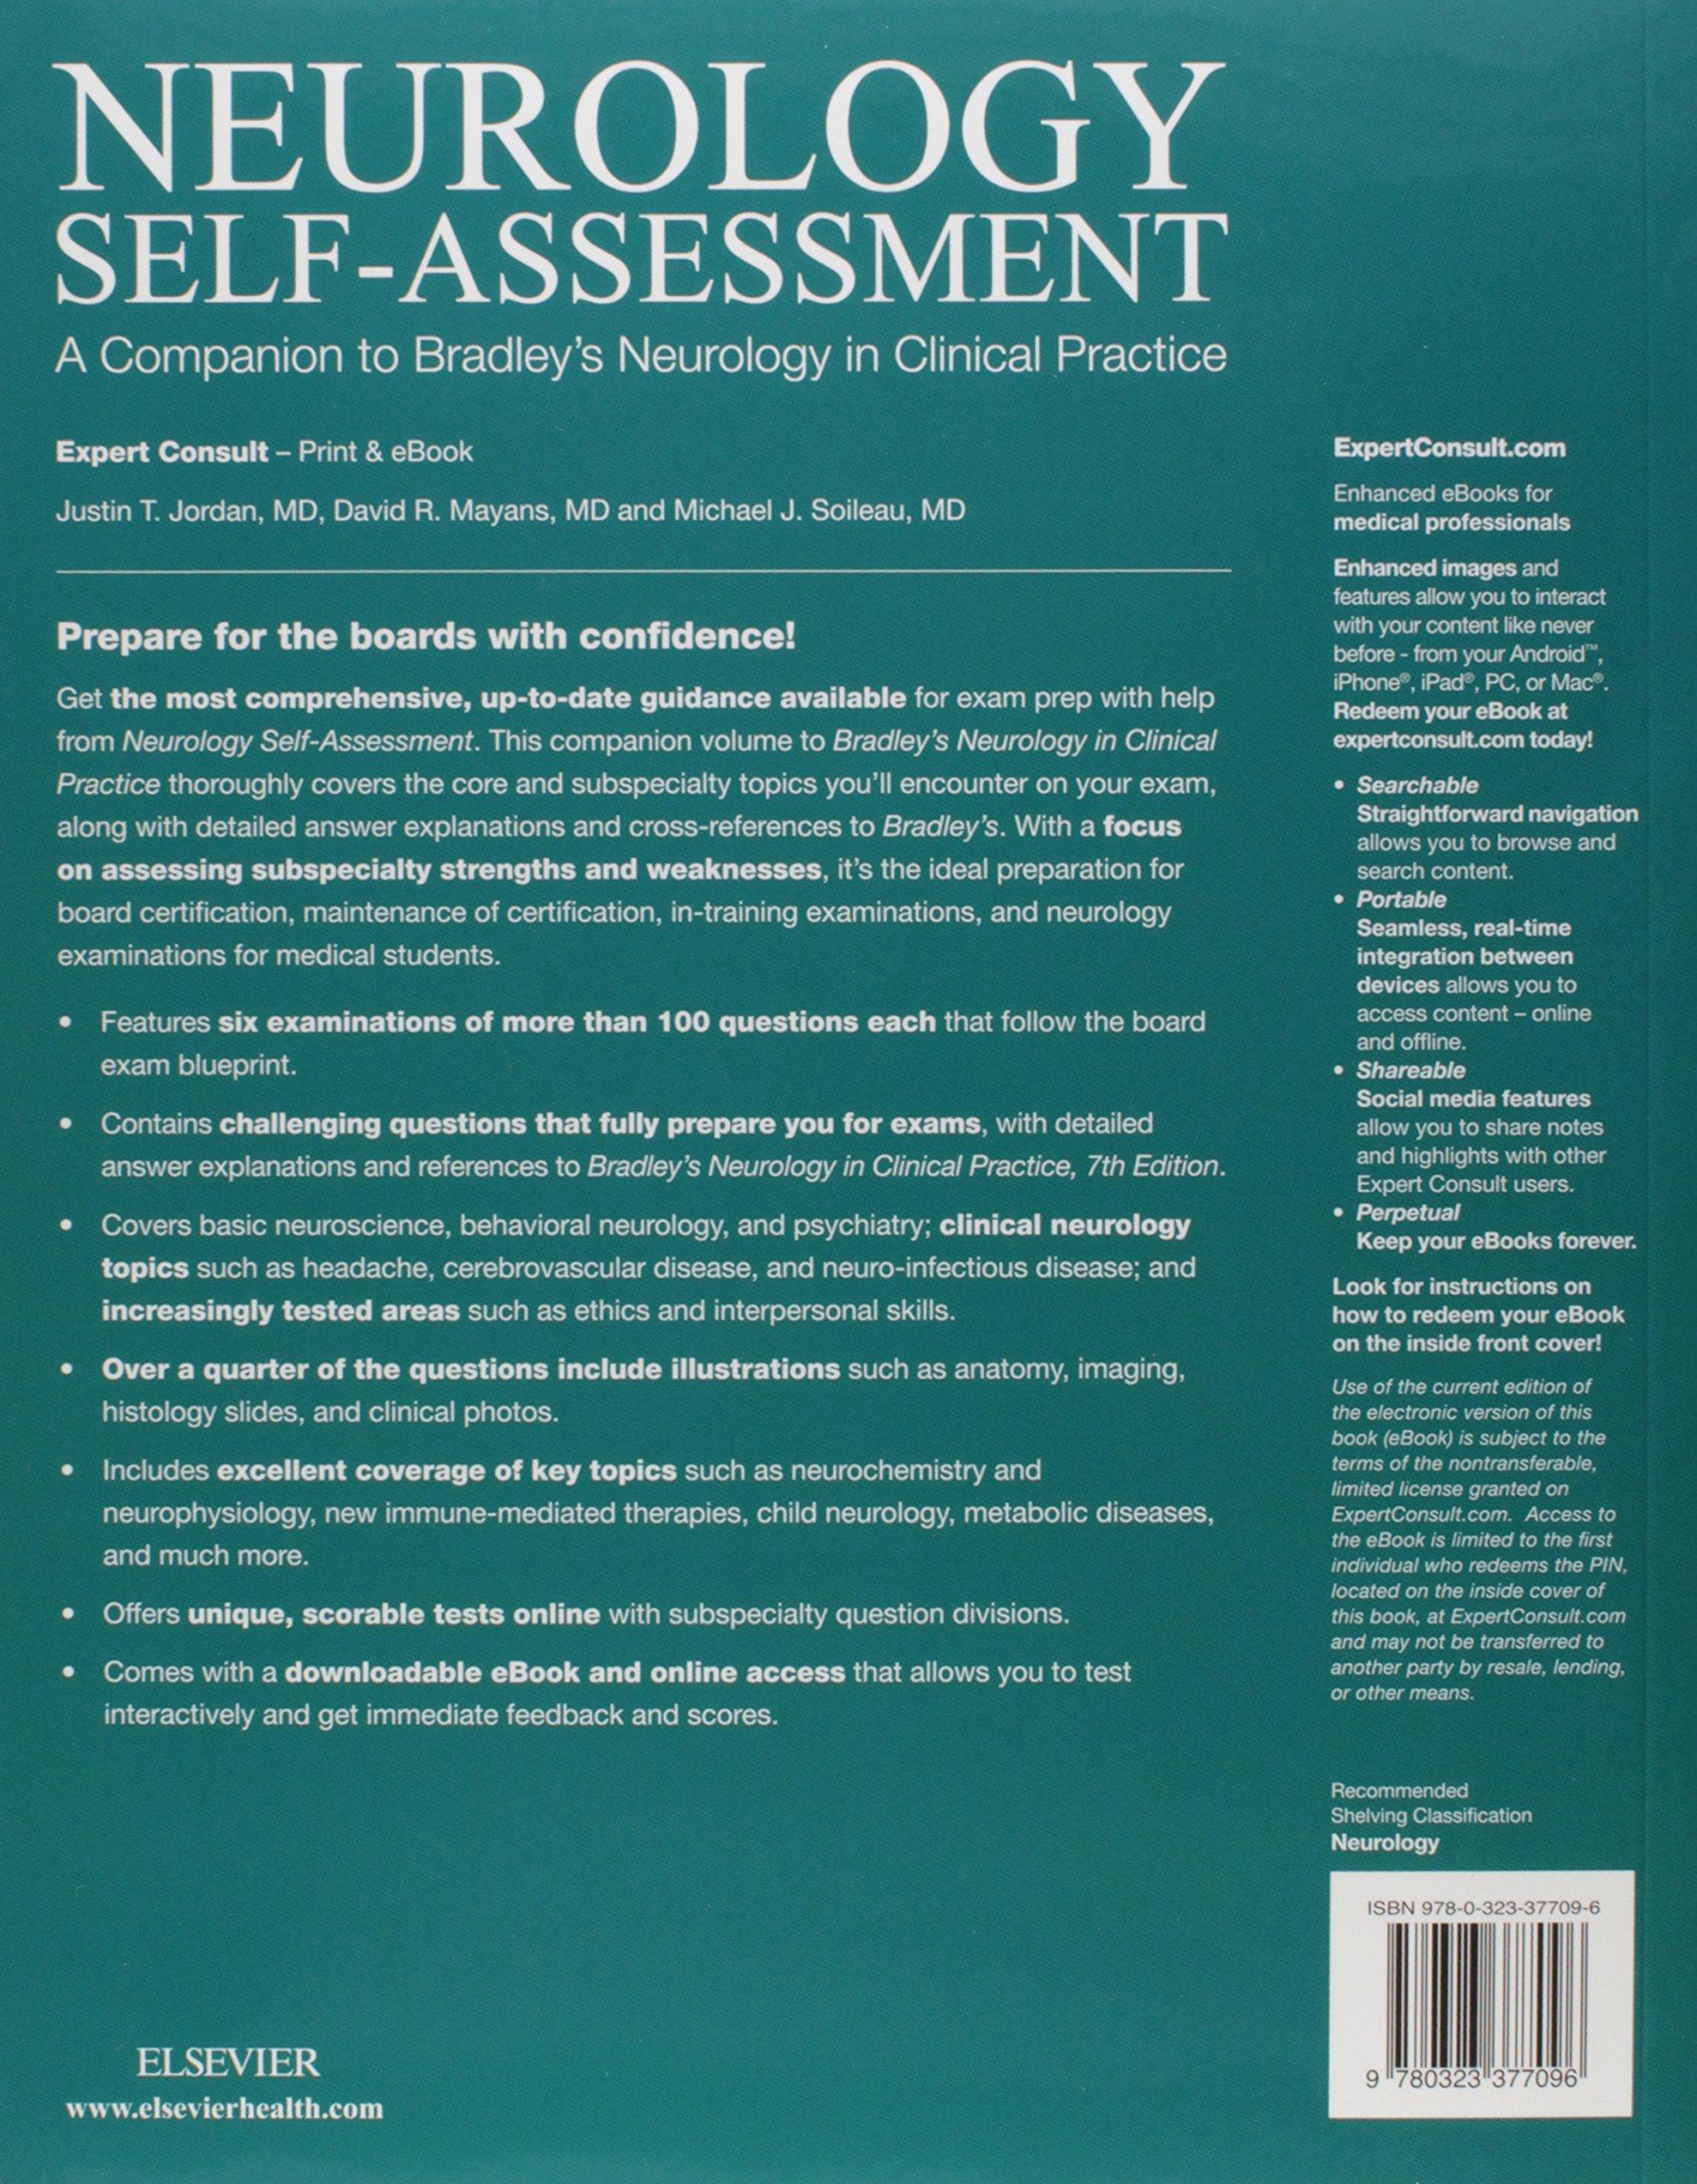 Buy Neurology Self-Assessment: A Companion to Bradley's